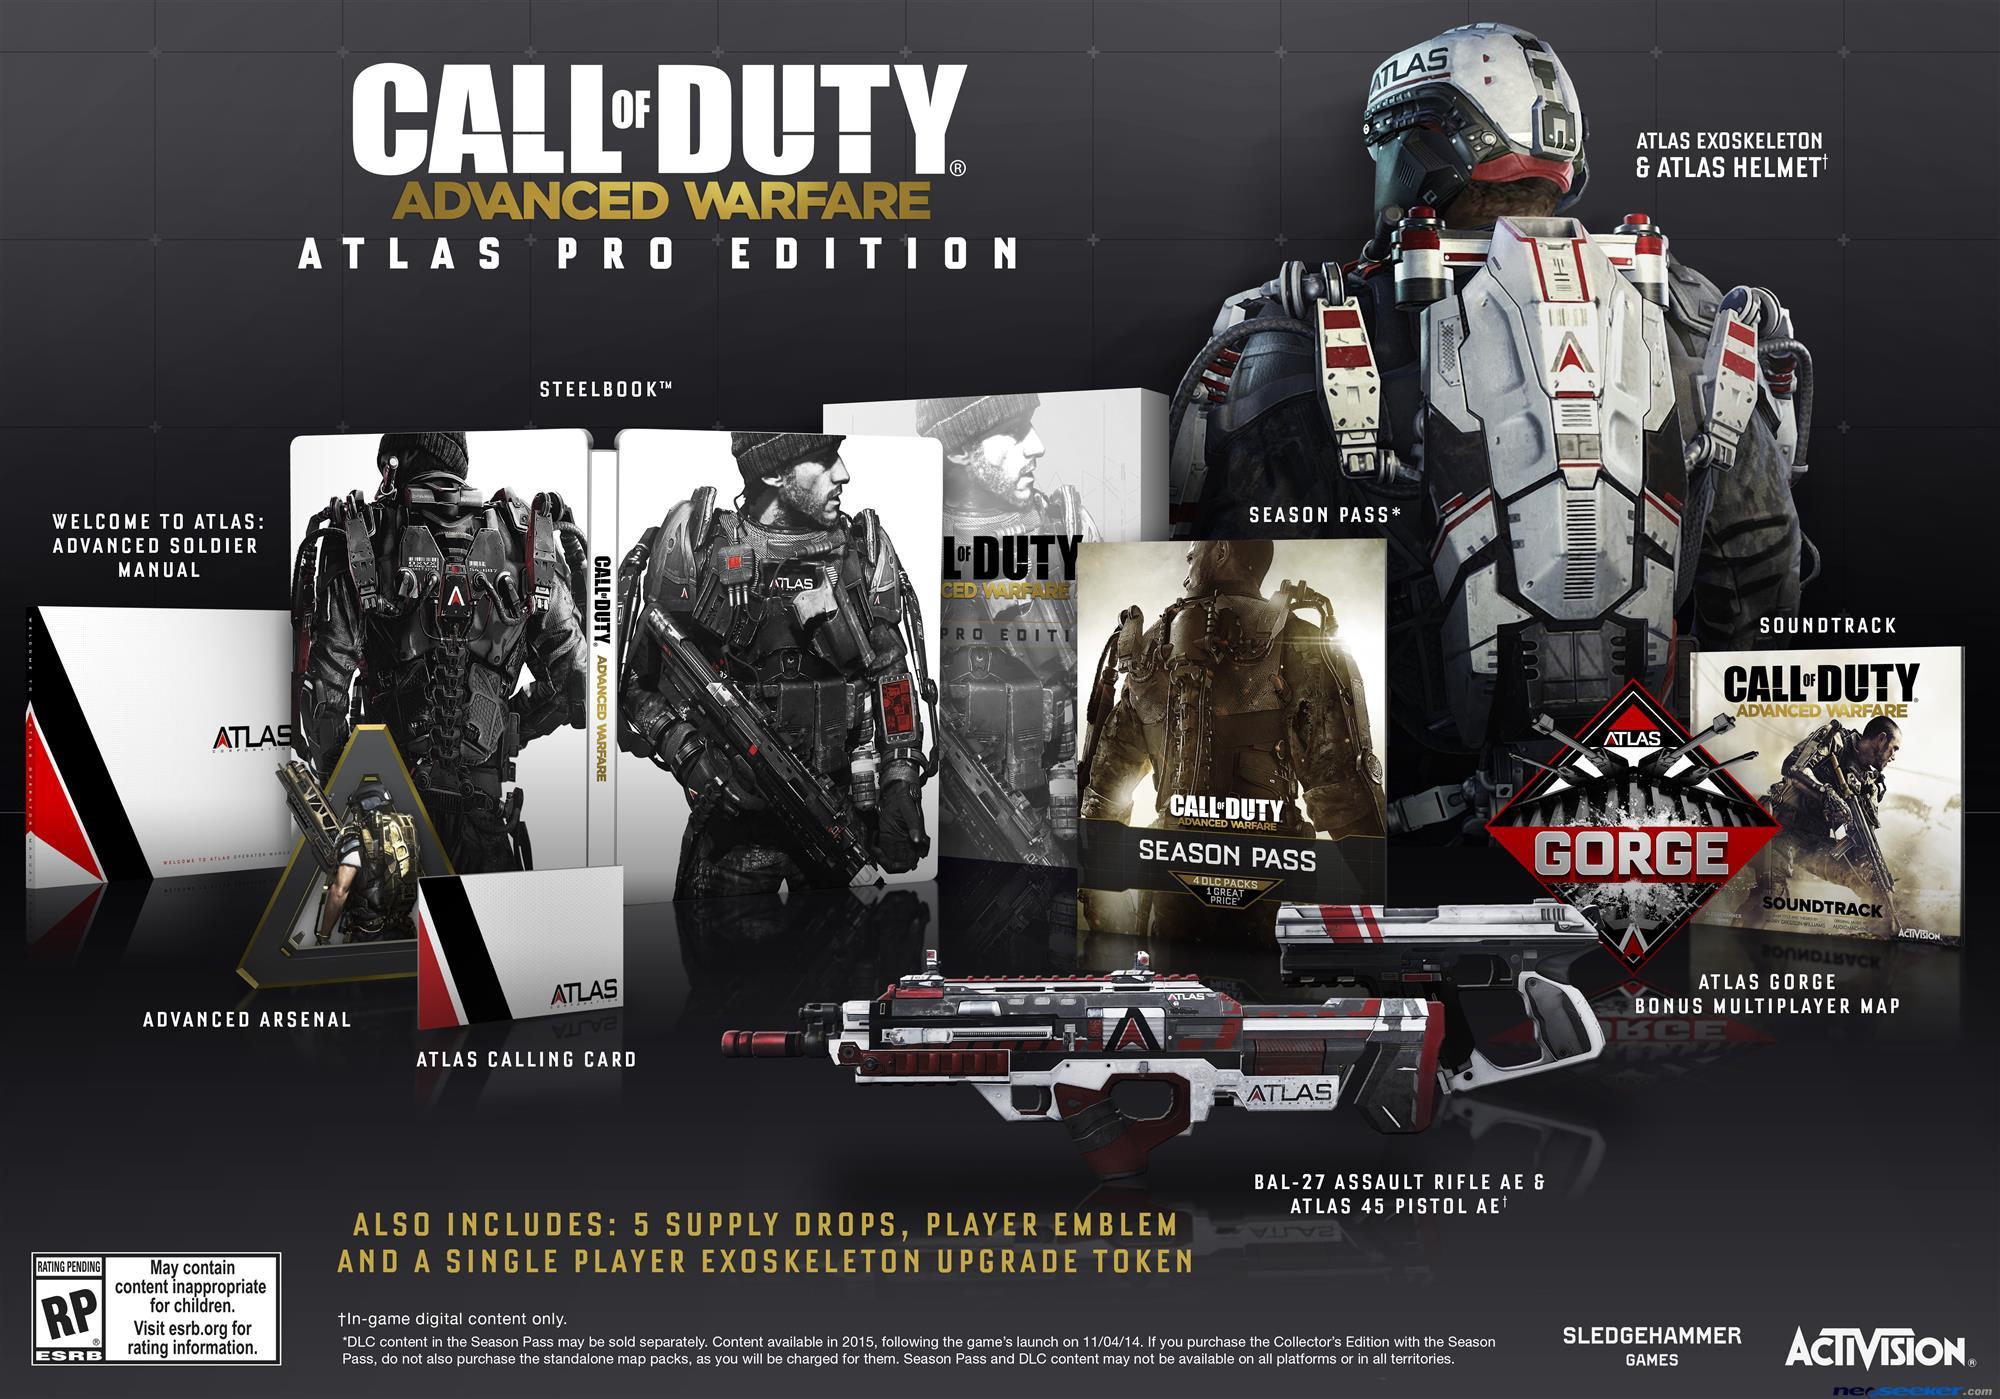 Call Of Duty: Advanced Warfare Atlas Editions